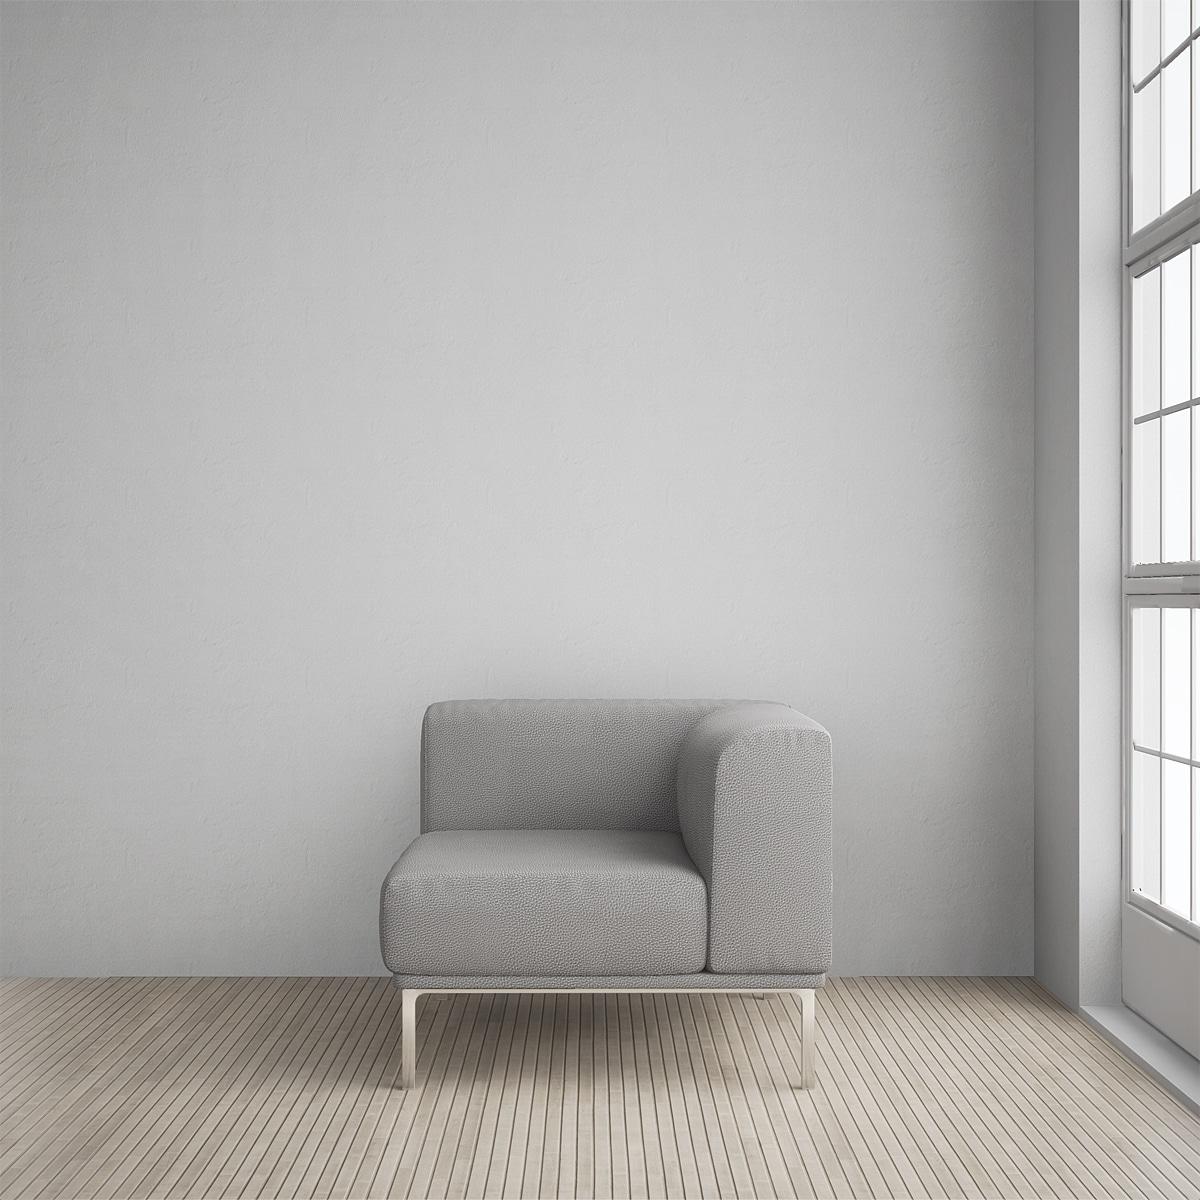 cassina moov sofa module 03 ue4arch. Black Bedroom Furniture Sets. Home Design Ideas